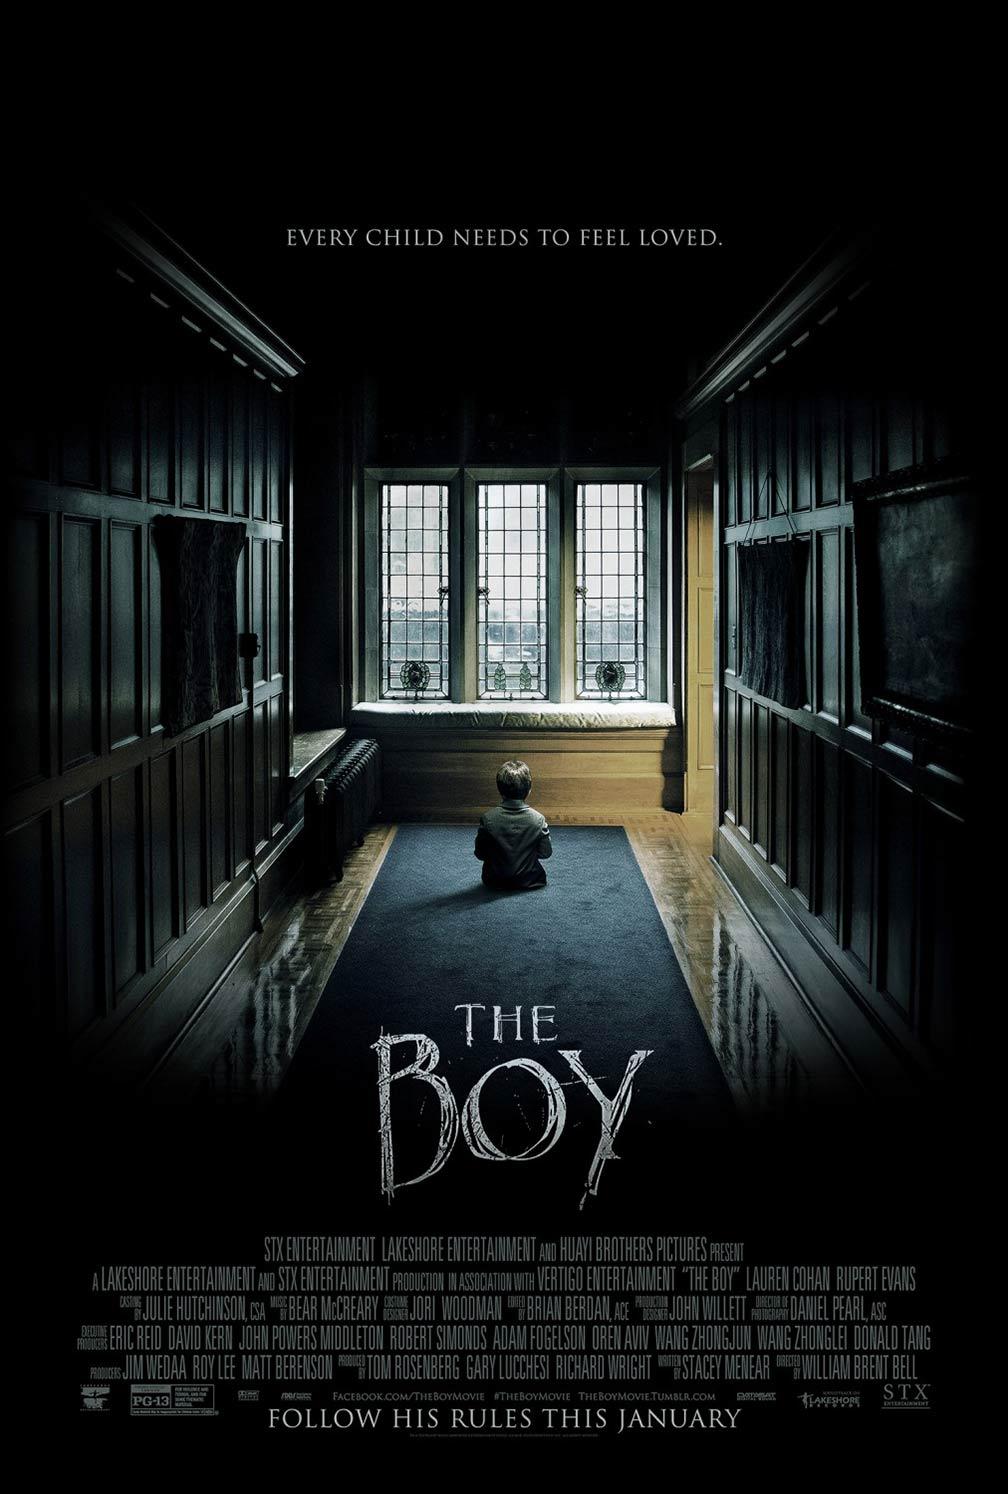 https://i2.wp.com/cdn.traileraddict.com/content/stx-entertainment/the-boy-2016.jpg